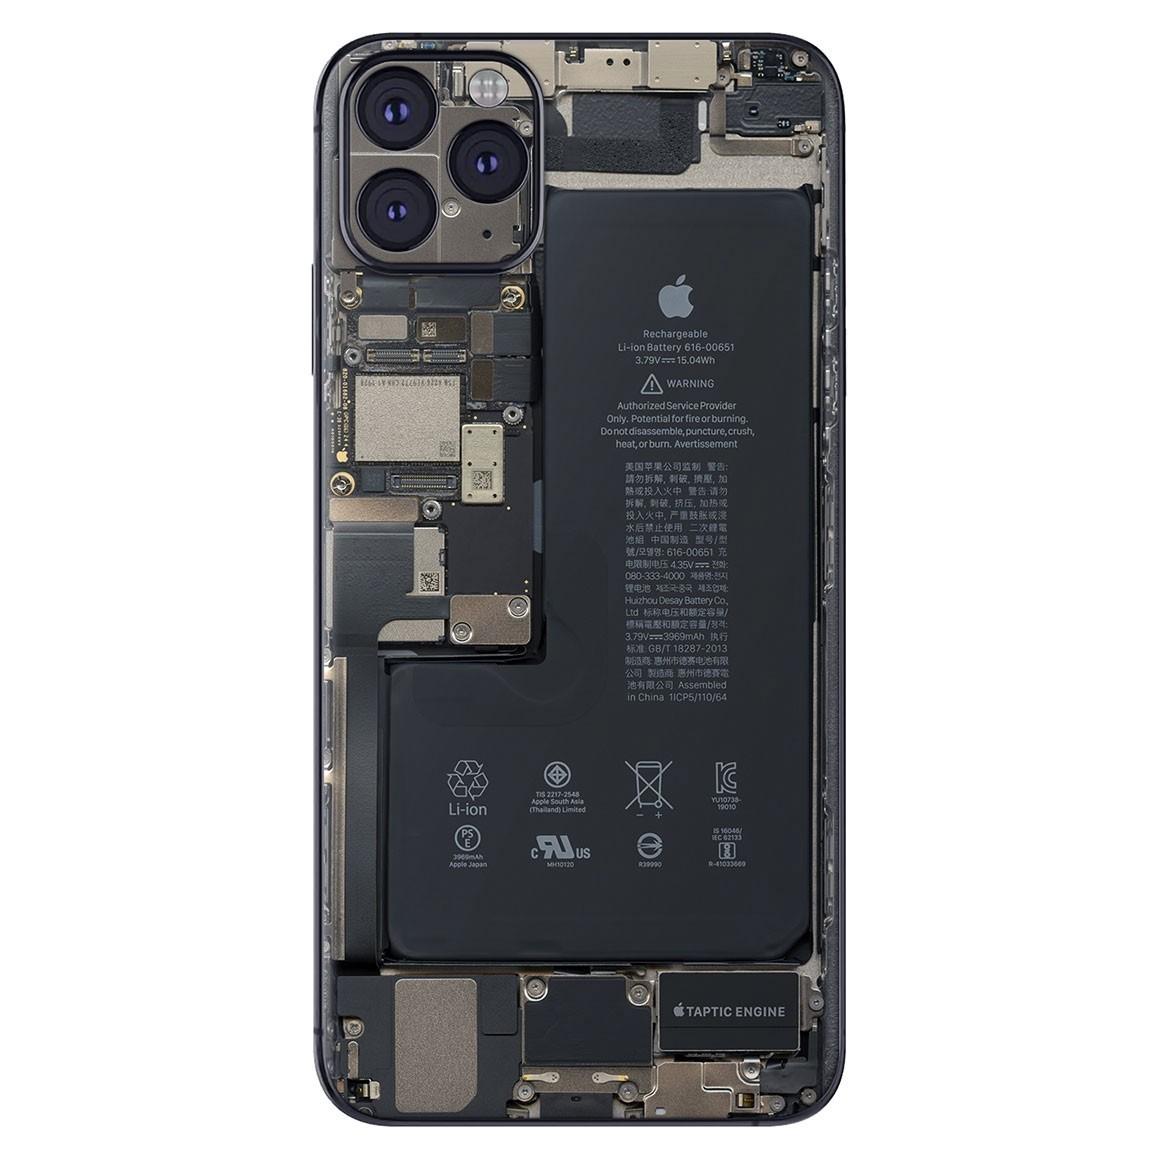 Transparent Series Skins Iphone 11 Pro Max Internal Case 1160x1160 Download Hd Wallpaper Wallpapertip